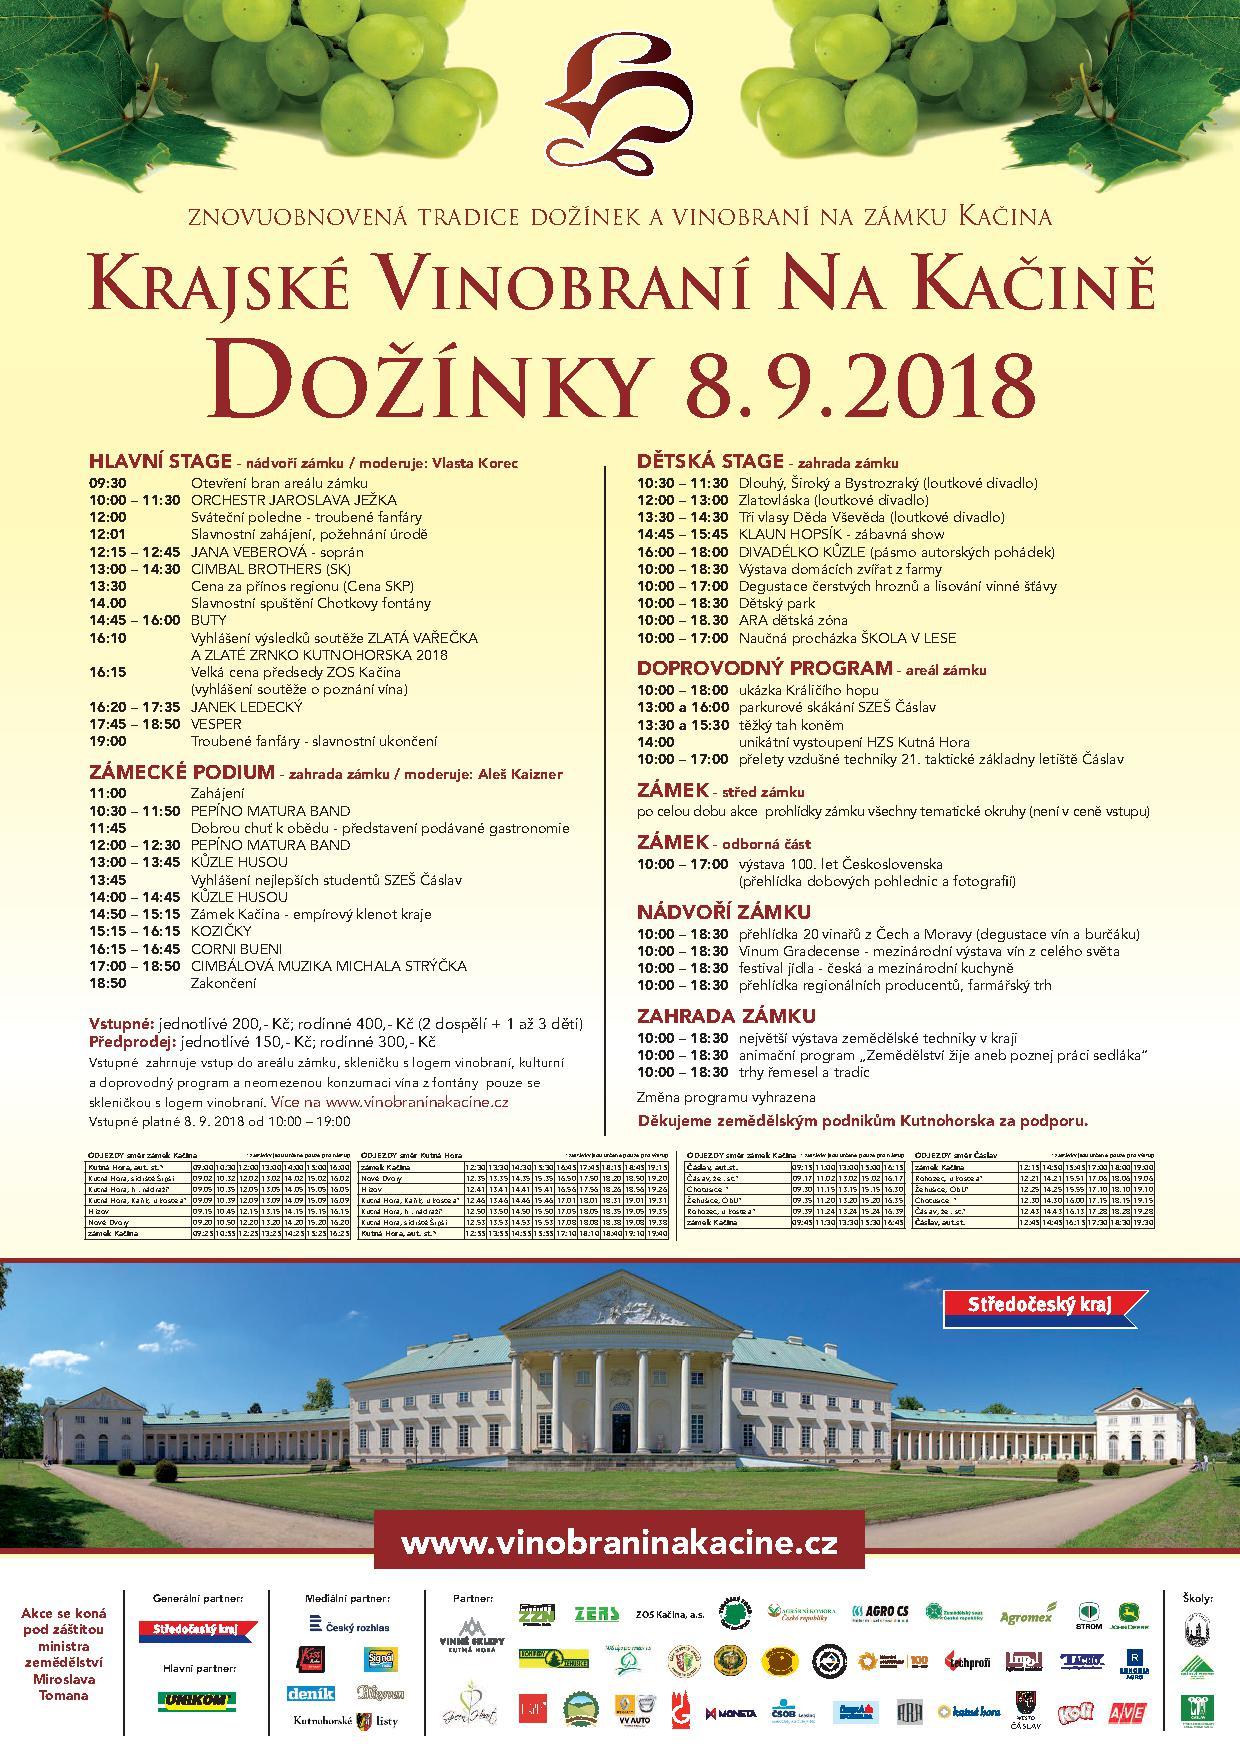 3153-plakat-2018-qxd-vinobrani-1.jpg